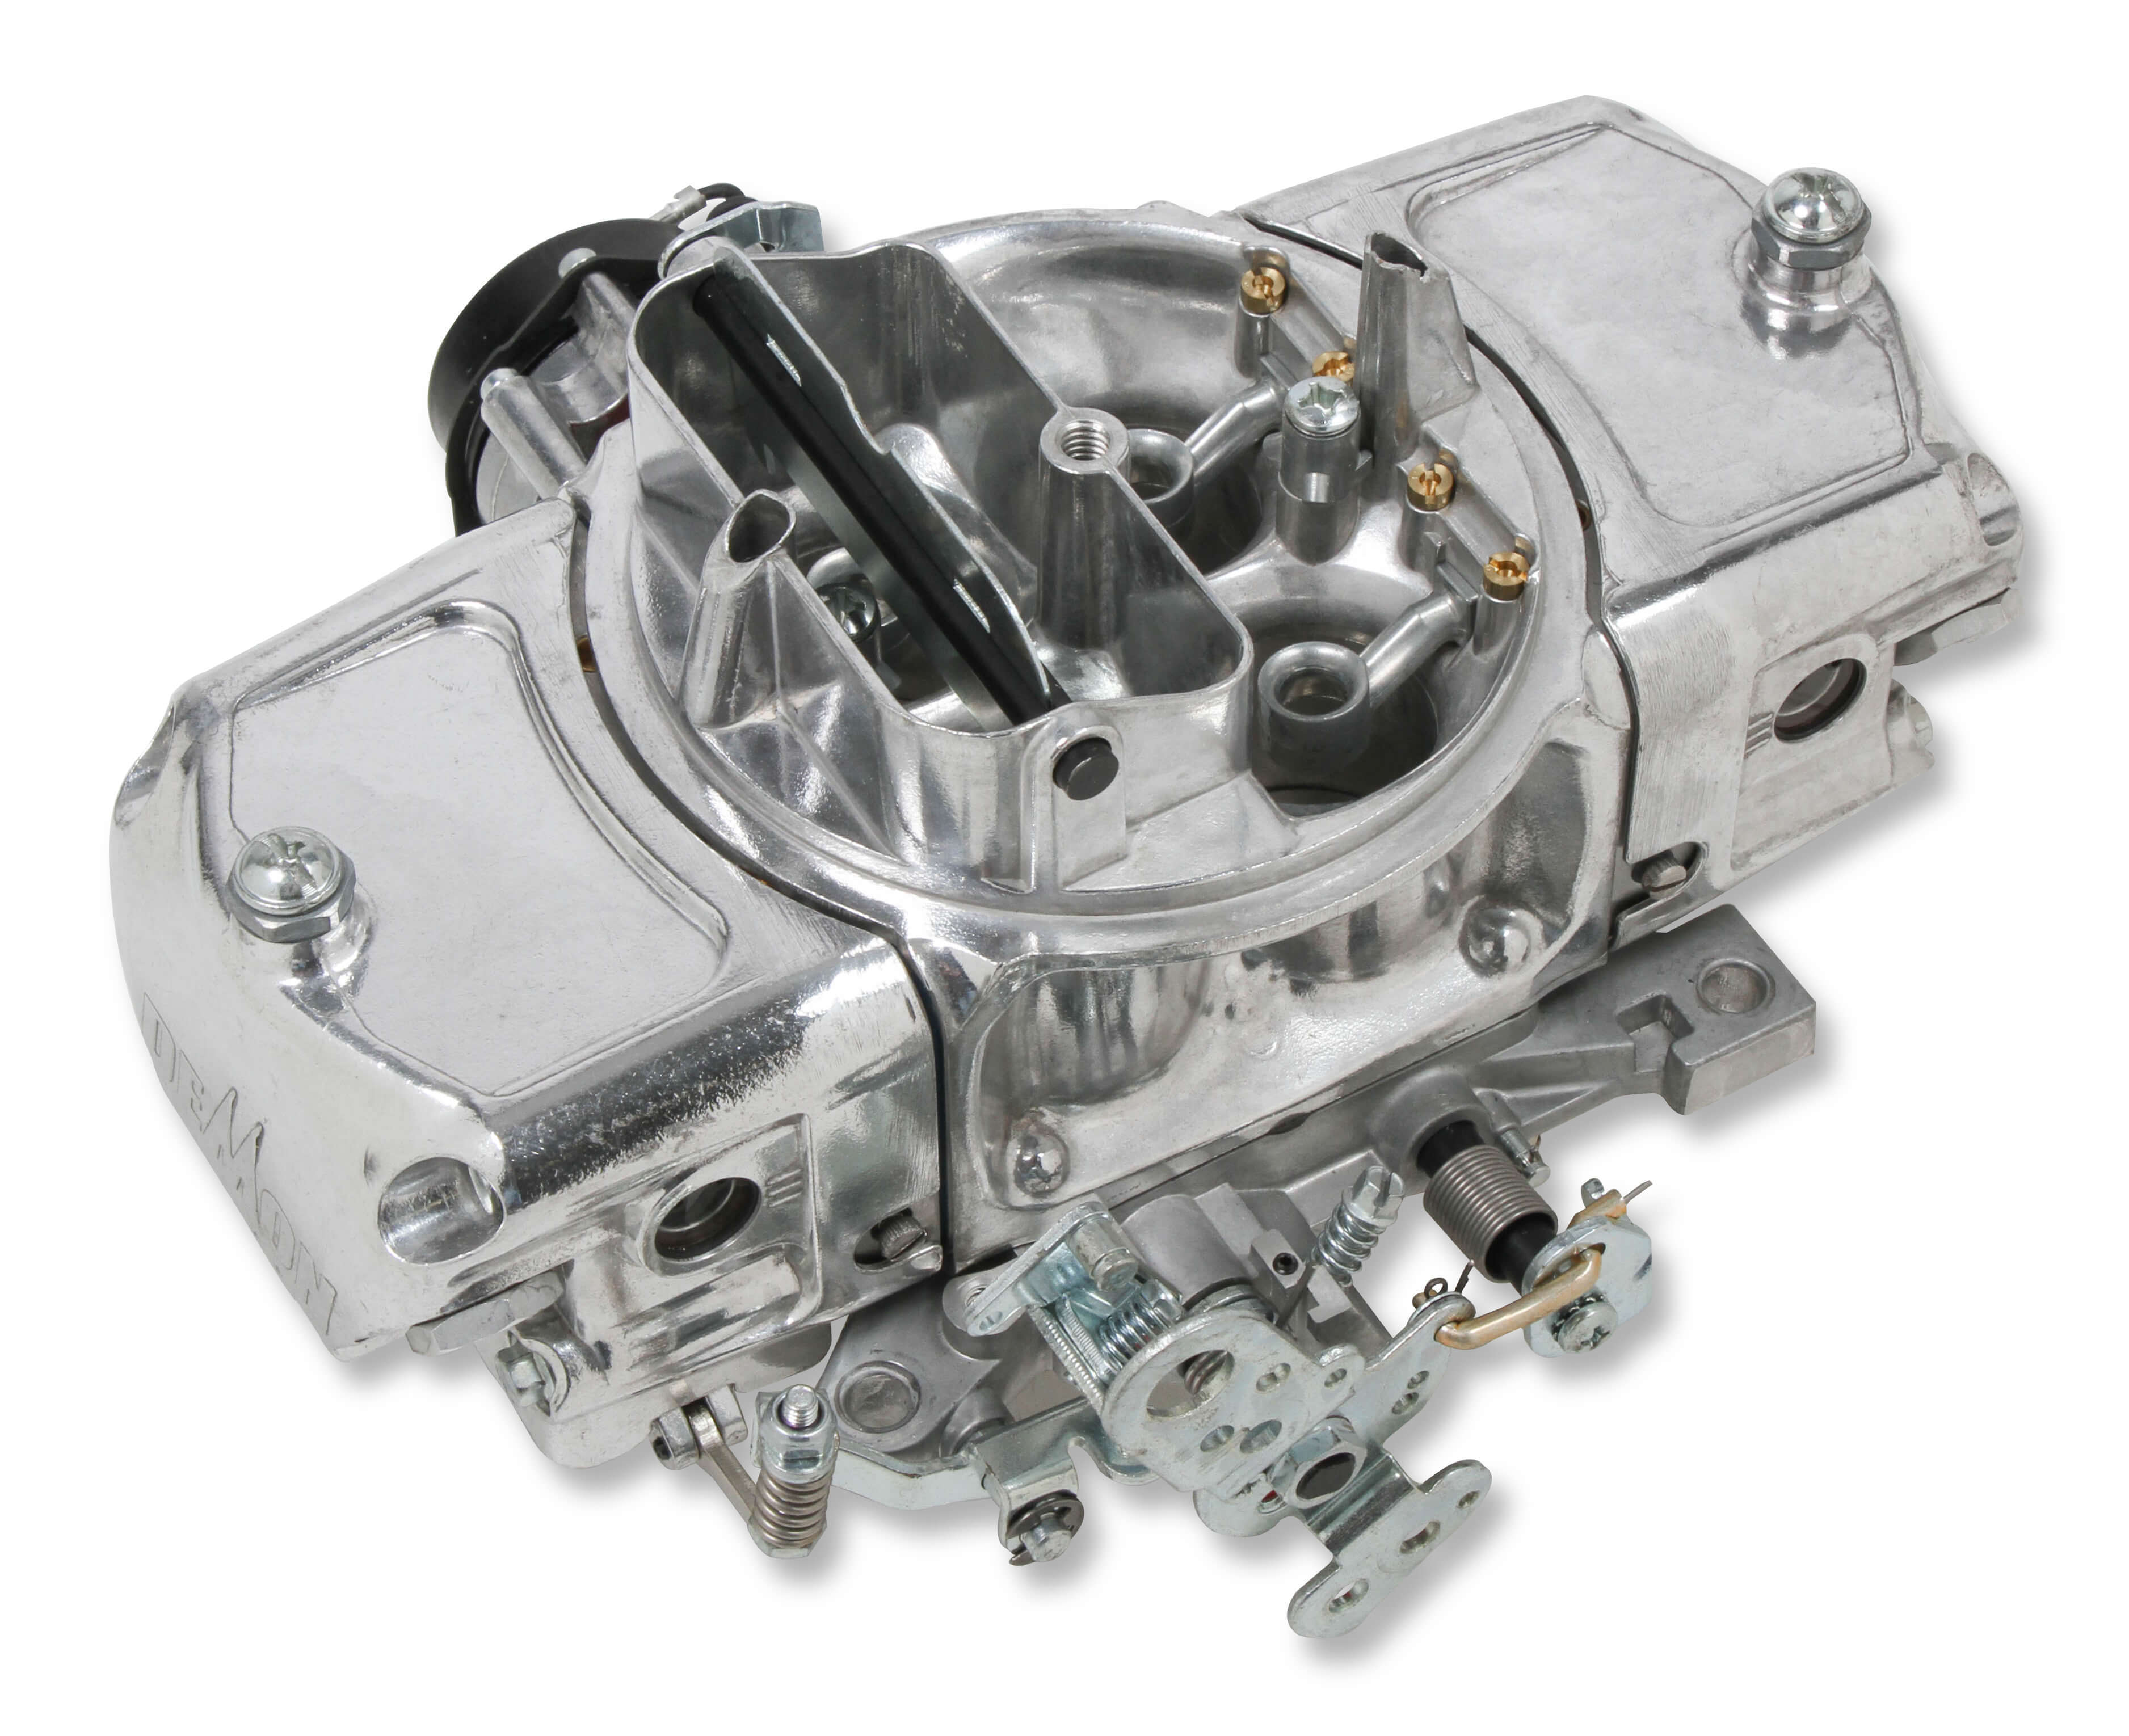 Demon Carburetion RDA-750-MS Carburetor Road Demon 750 CFM